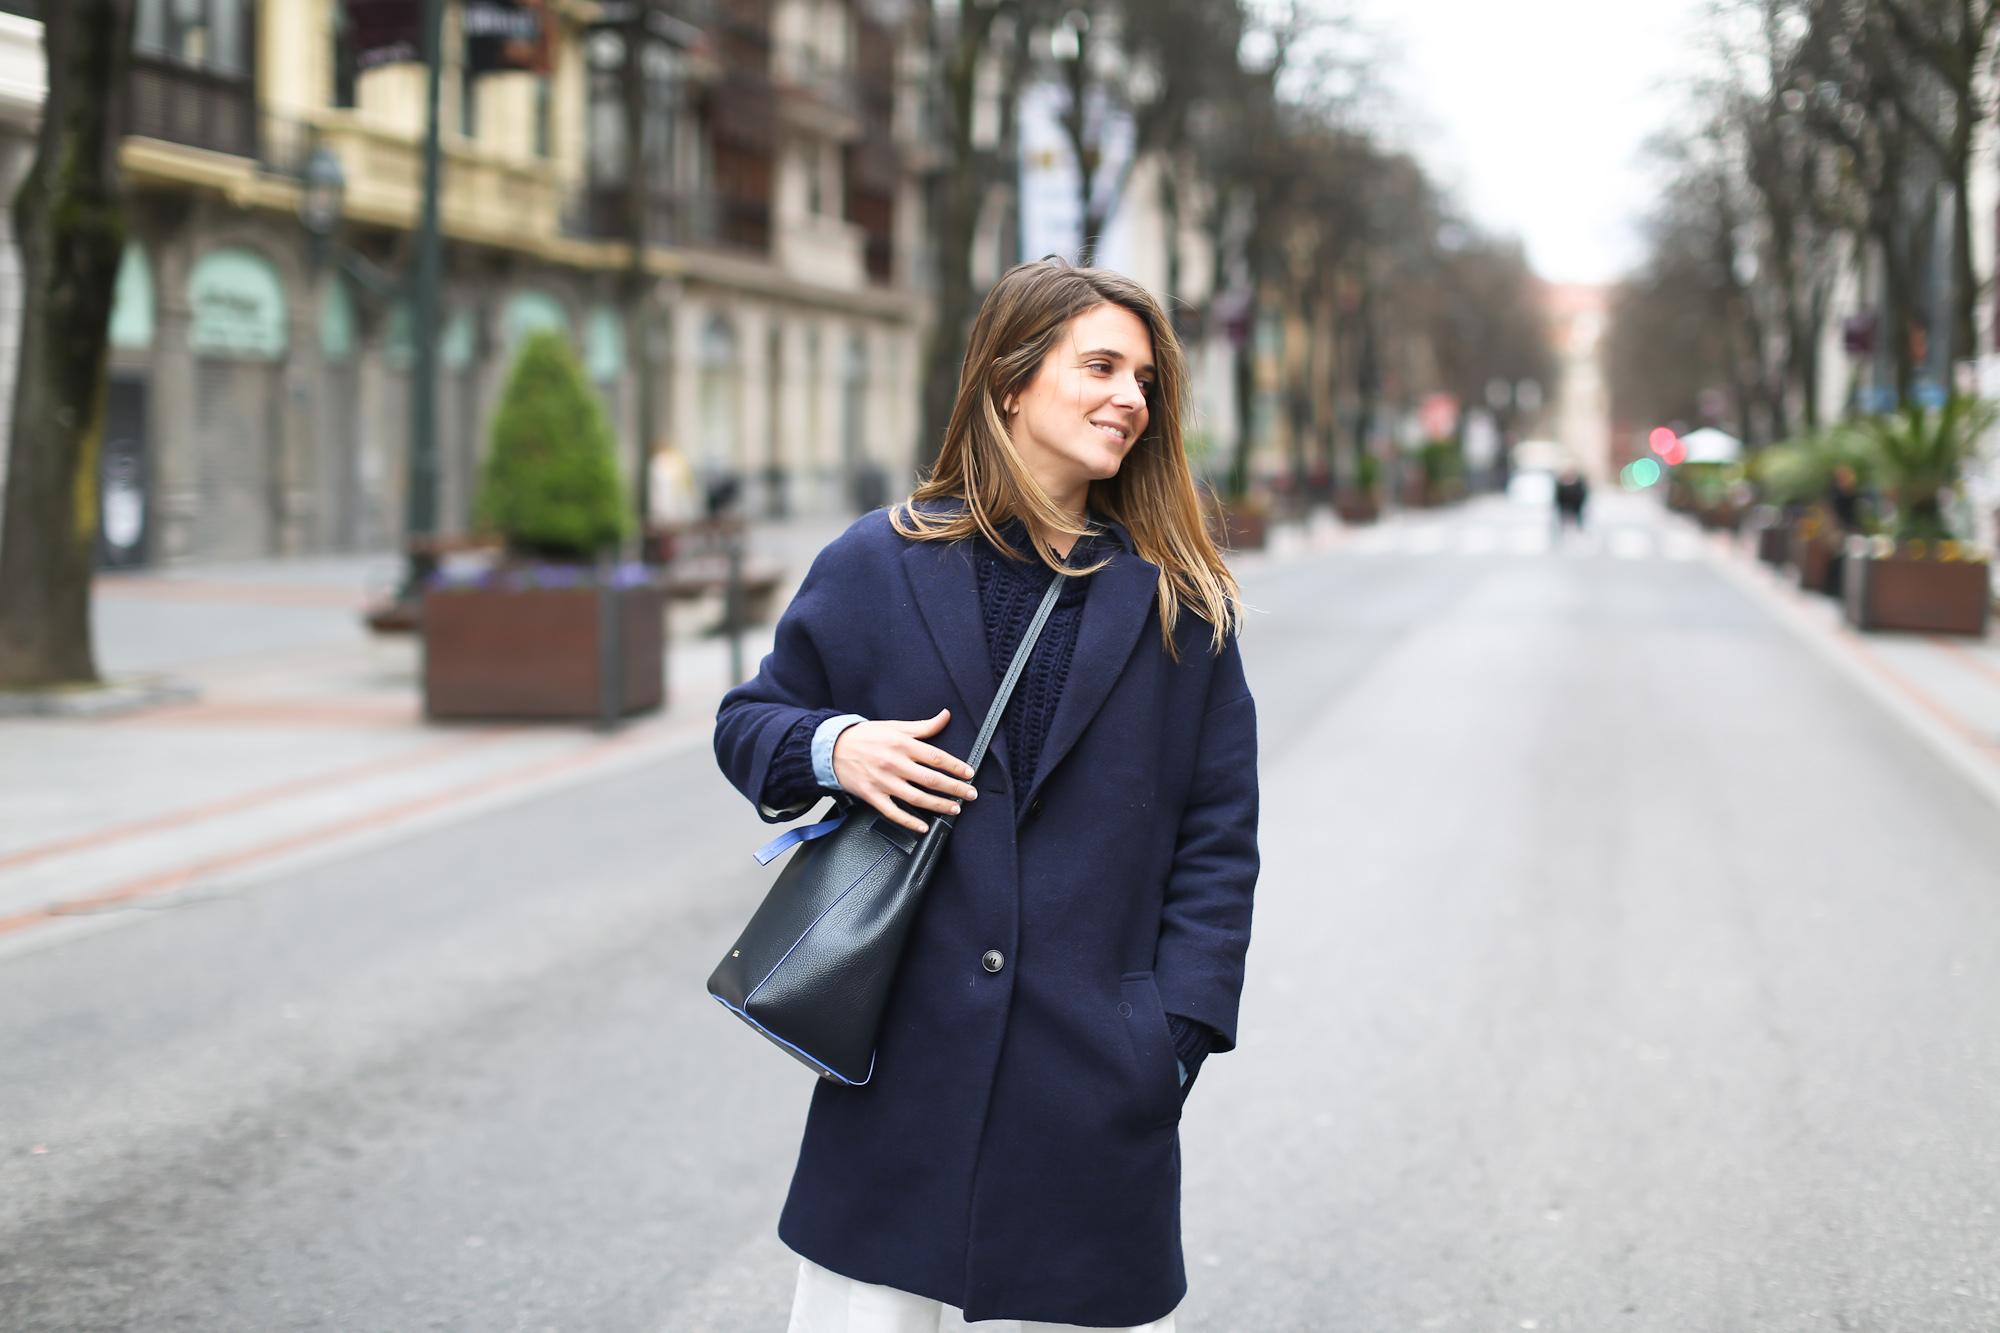 Clochet_streetstyle_masscob_coulson_coat_trimmerbilbao_granny_shoes_white_culottes-4